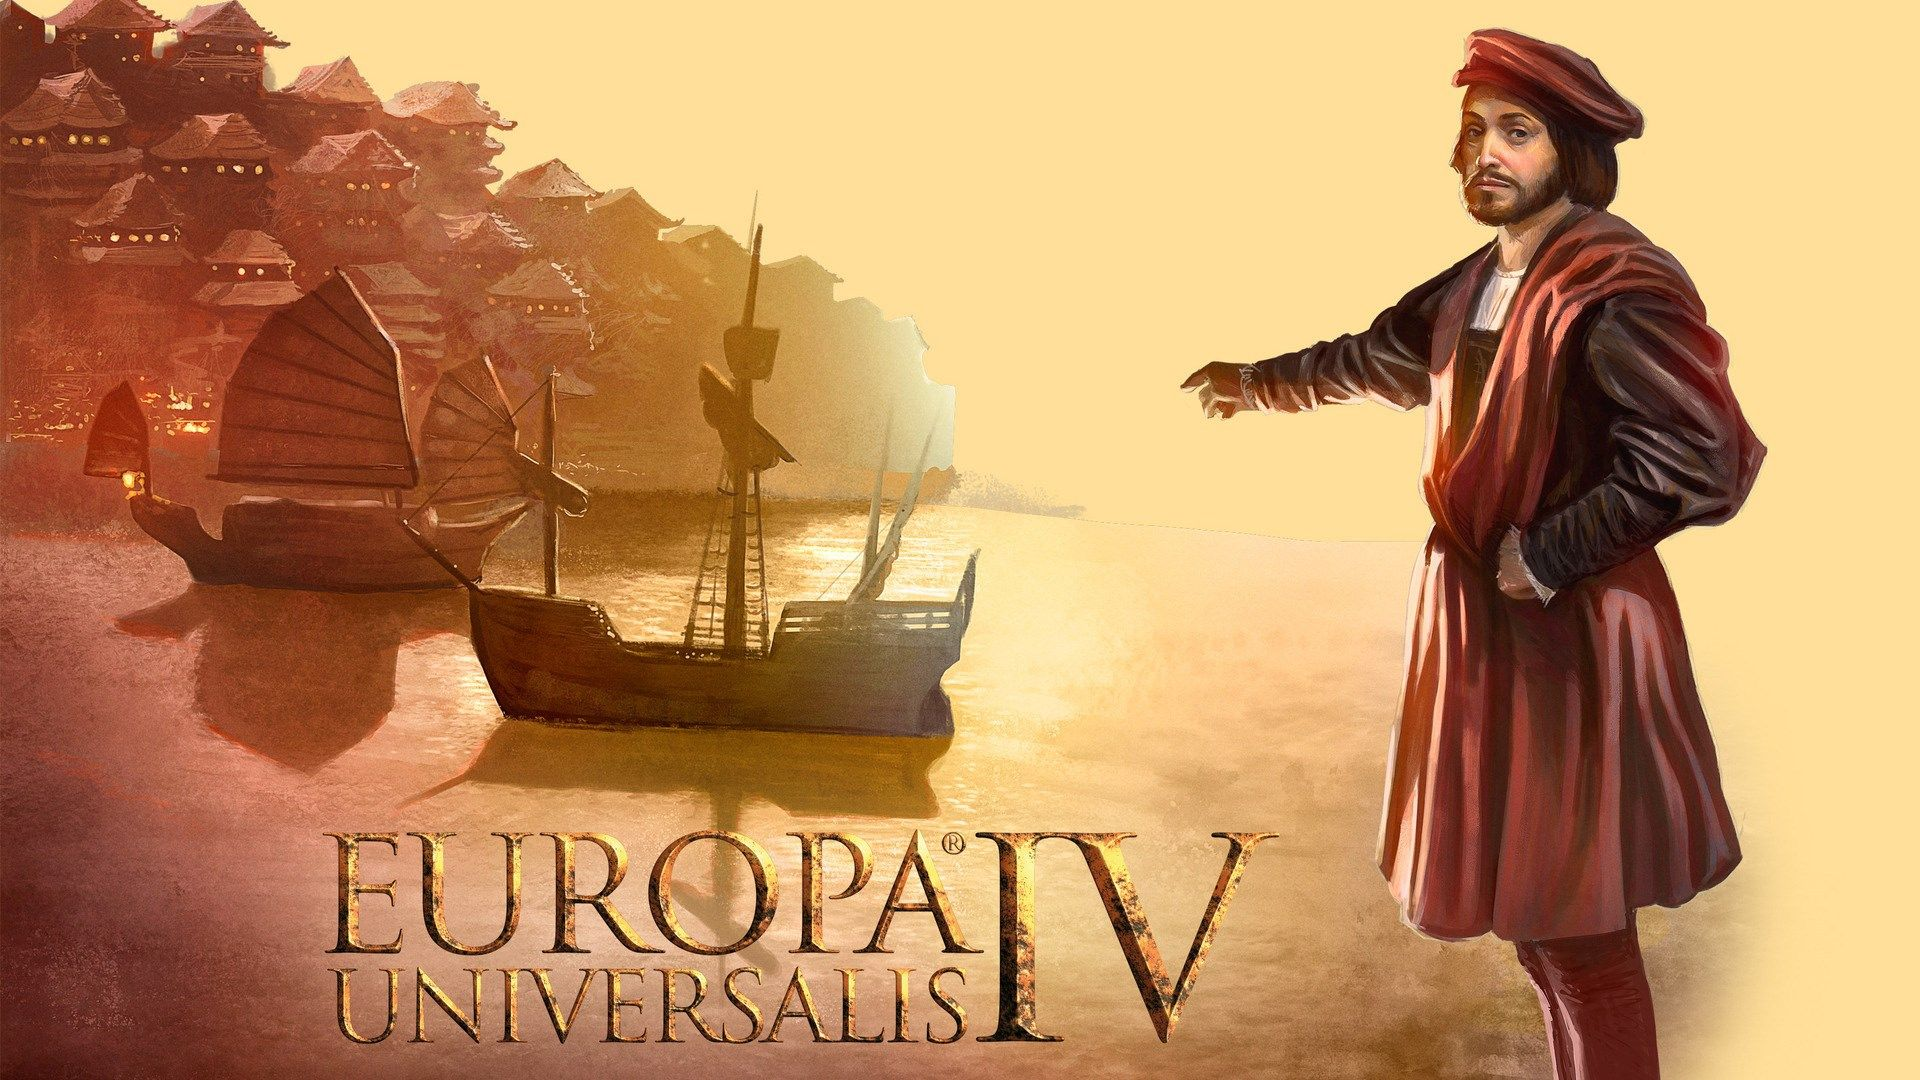 1920x1080 Europa Universalis Iv Game Wallpaper Europa